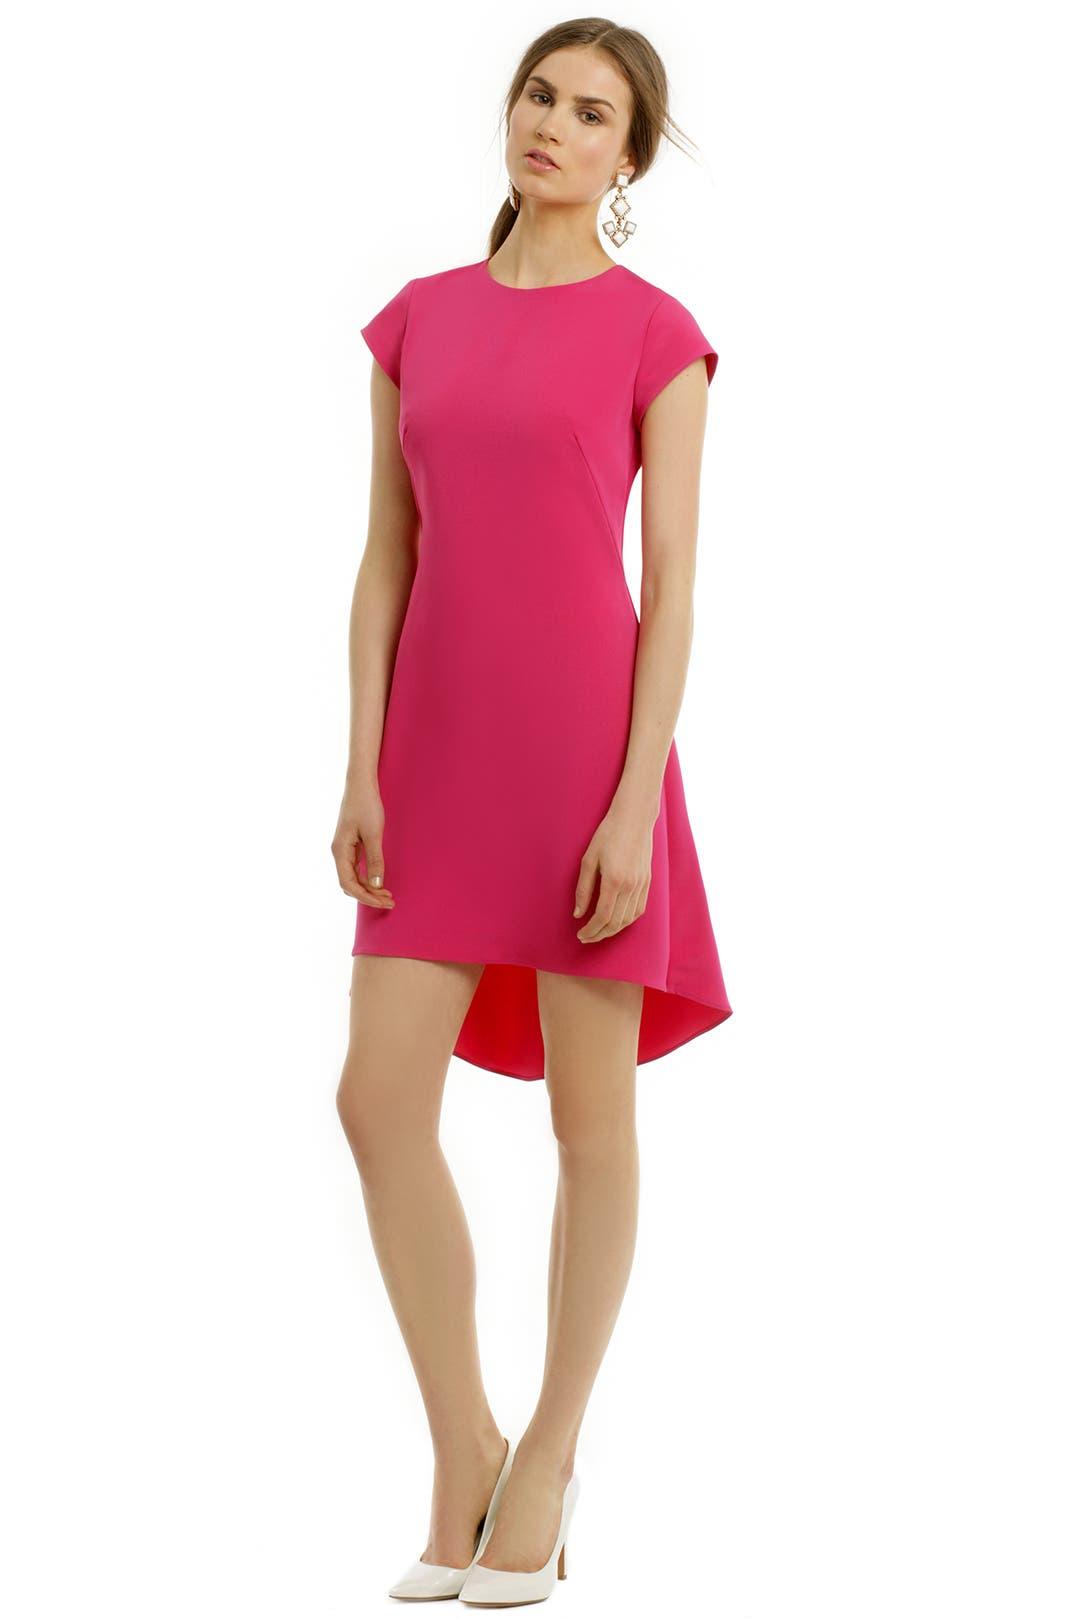 Palermo Dress by nha khanh